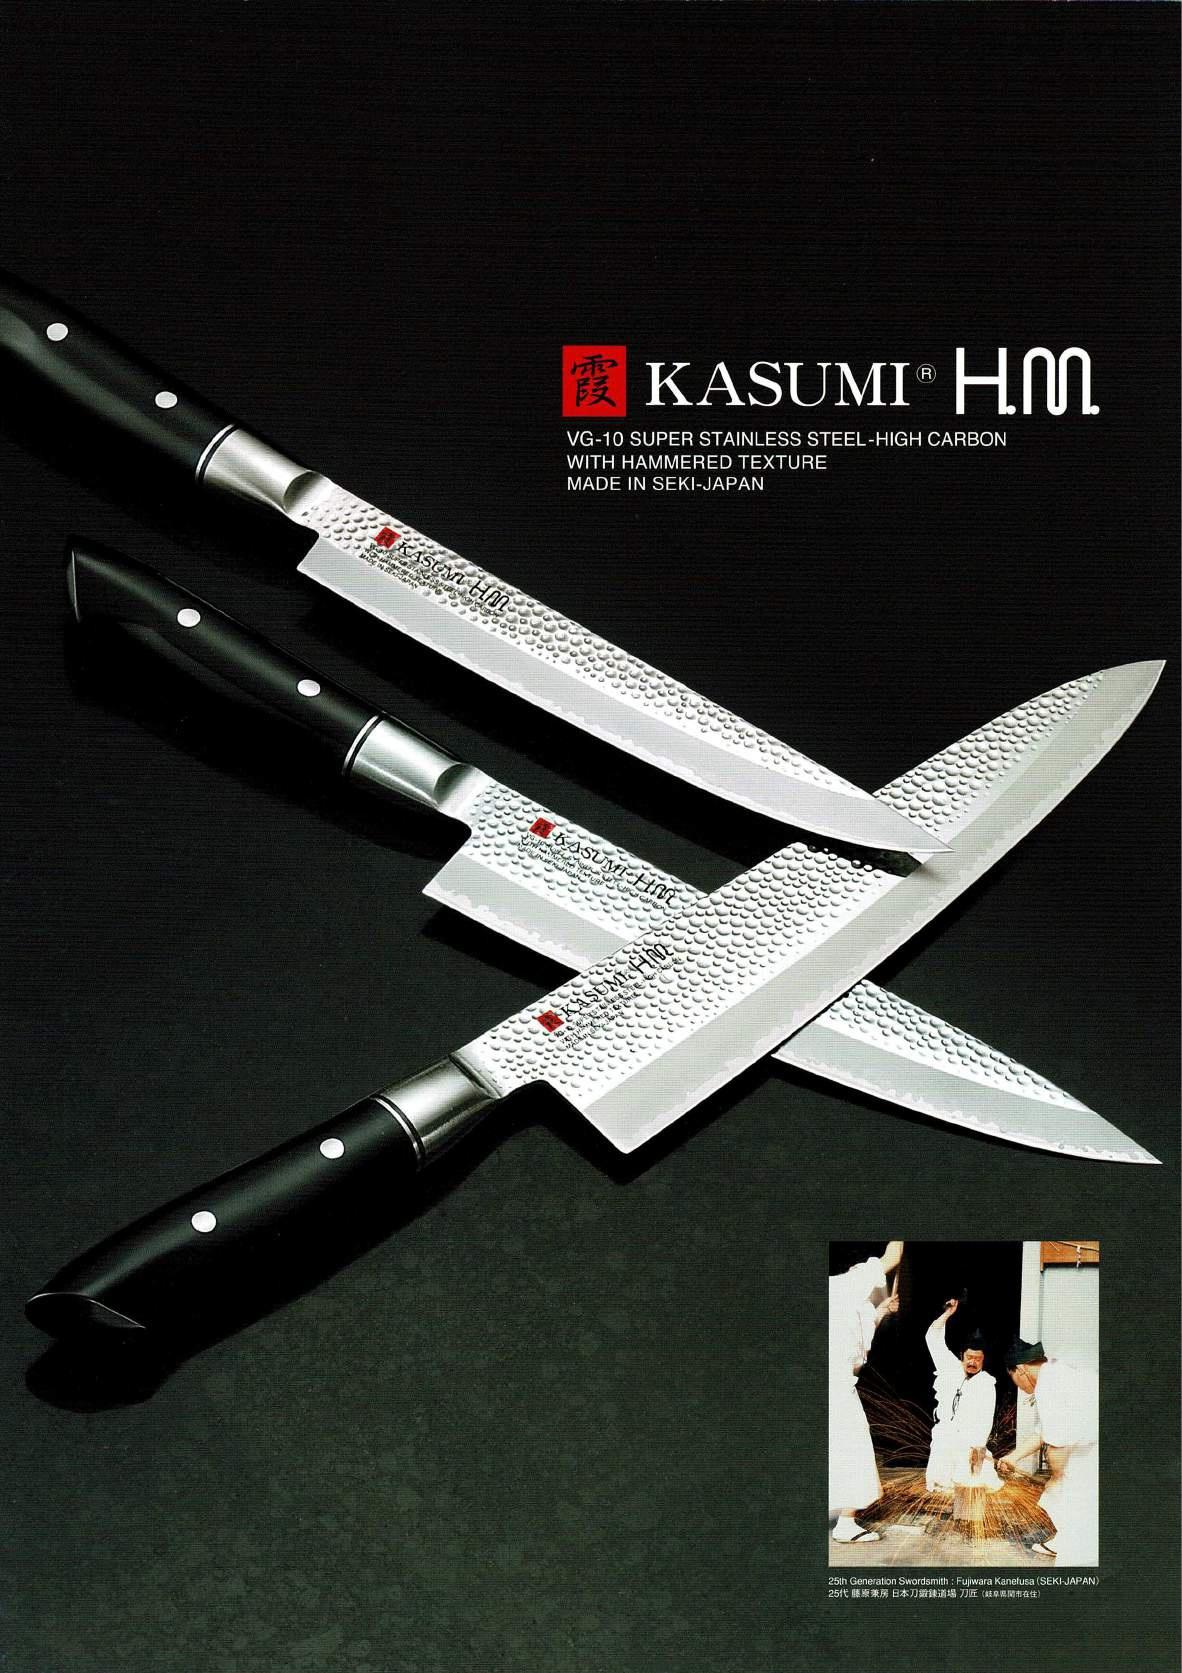 http://sumikama.co.jp/wp/wp-content/uploads/2018/12/kasumi_hm_i.jpg